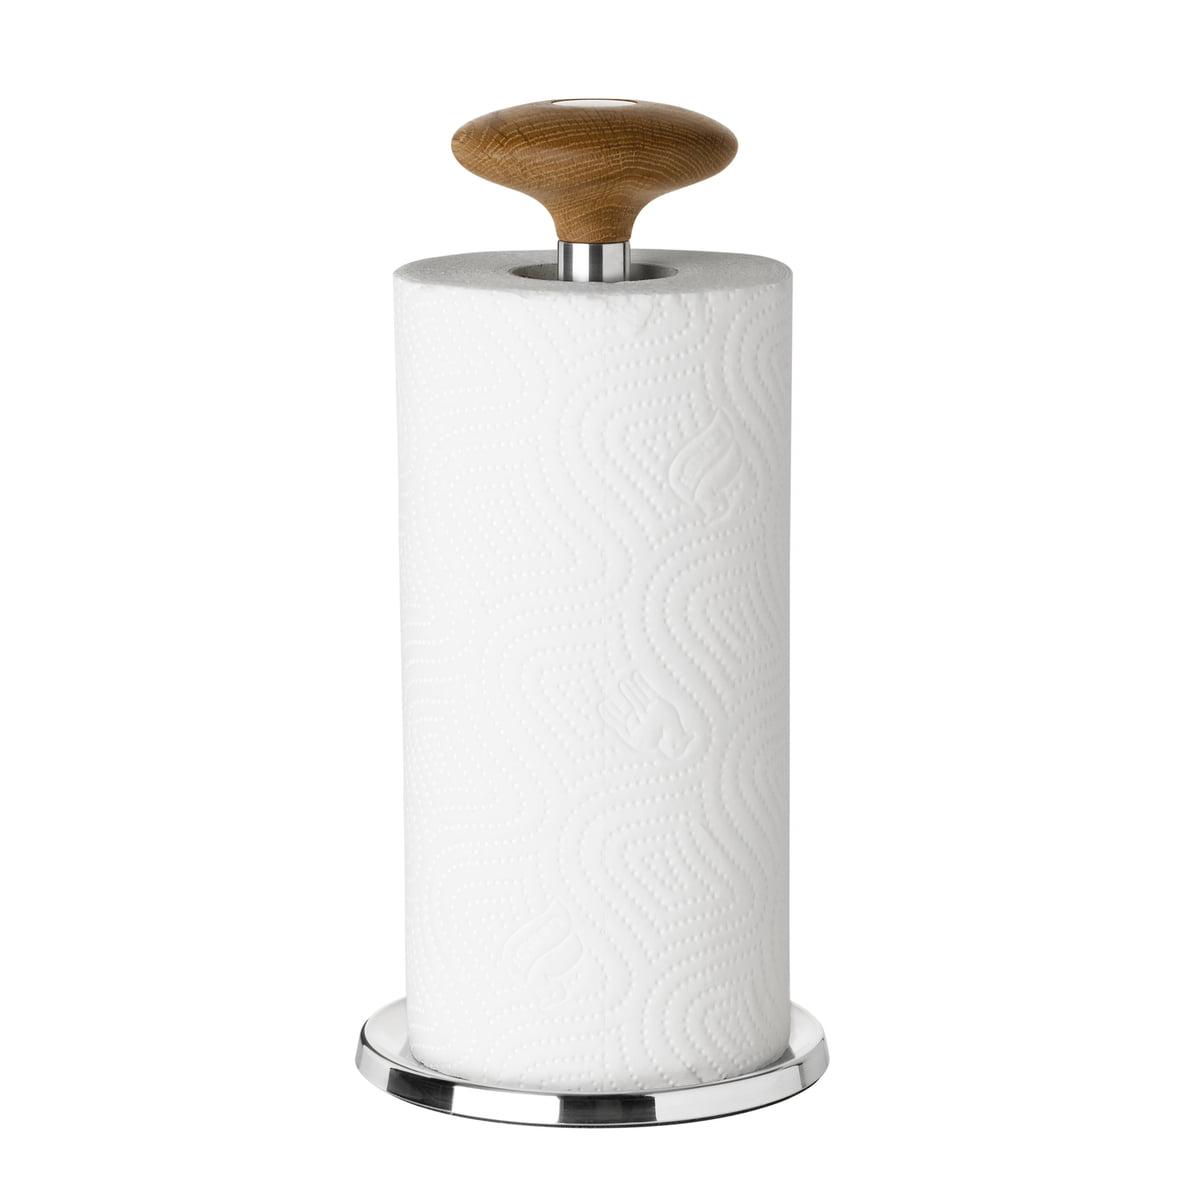 K Chenrollenhalter Holz awesome halter für küchenrolle gallery house design ideas cuscinema us